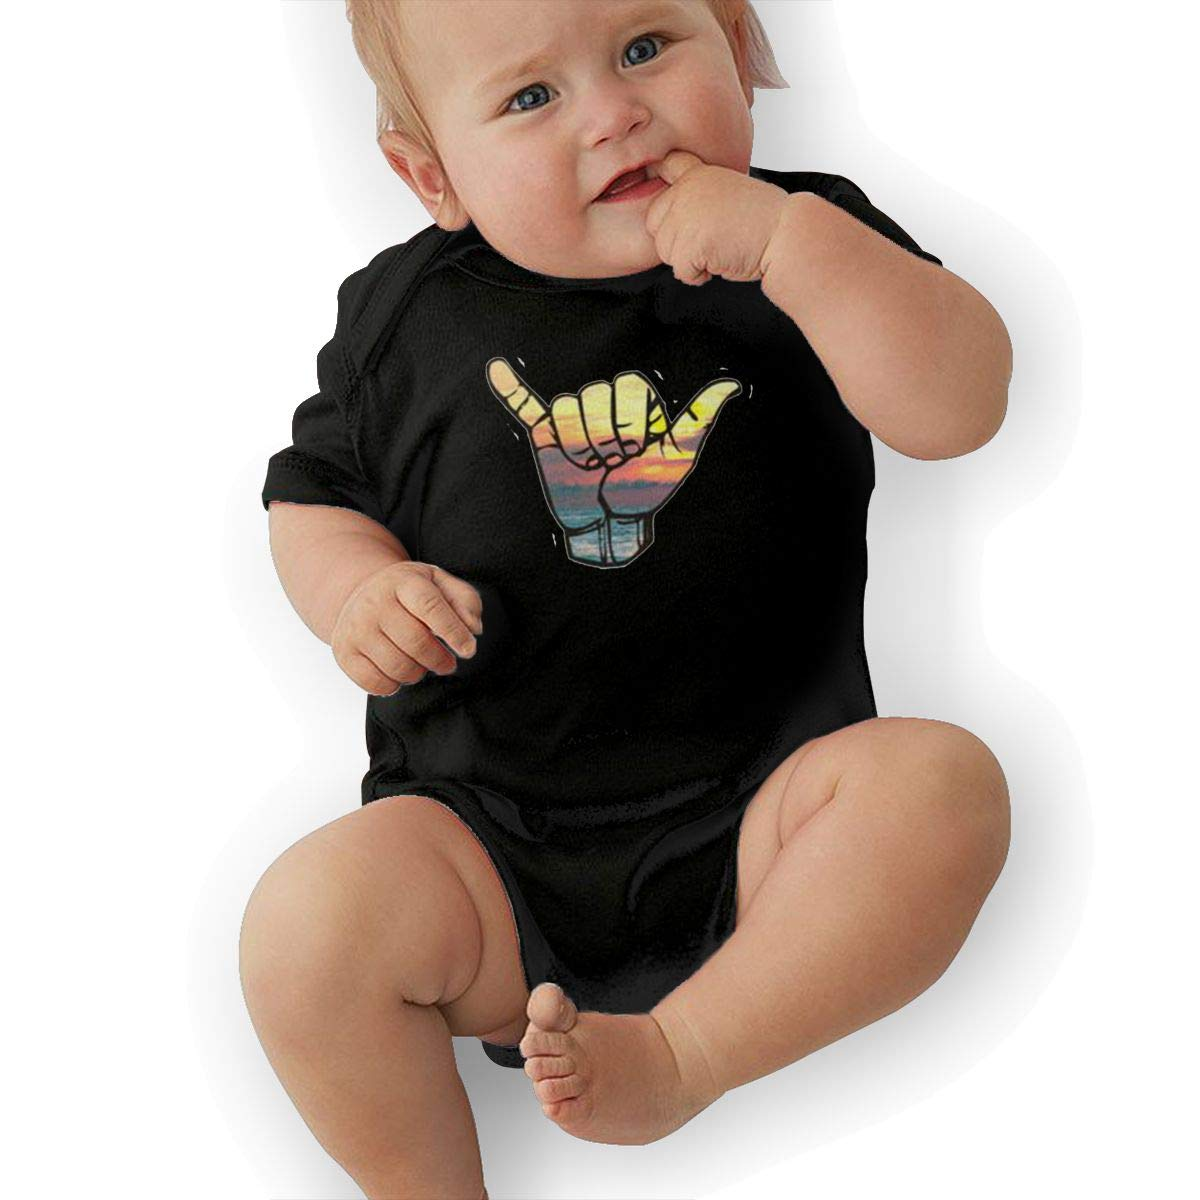 Dfenere Rocker Graphic Newborn Baby Short Sleeve Bodysuit Romper Infant Summer Clothing